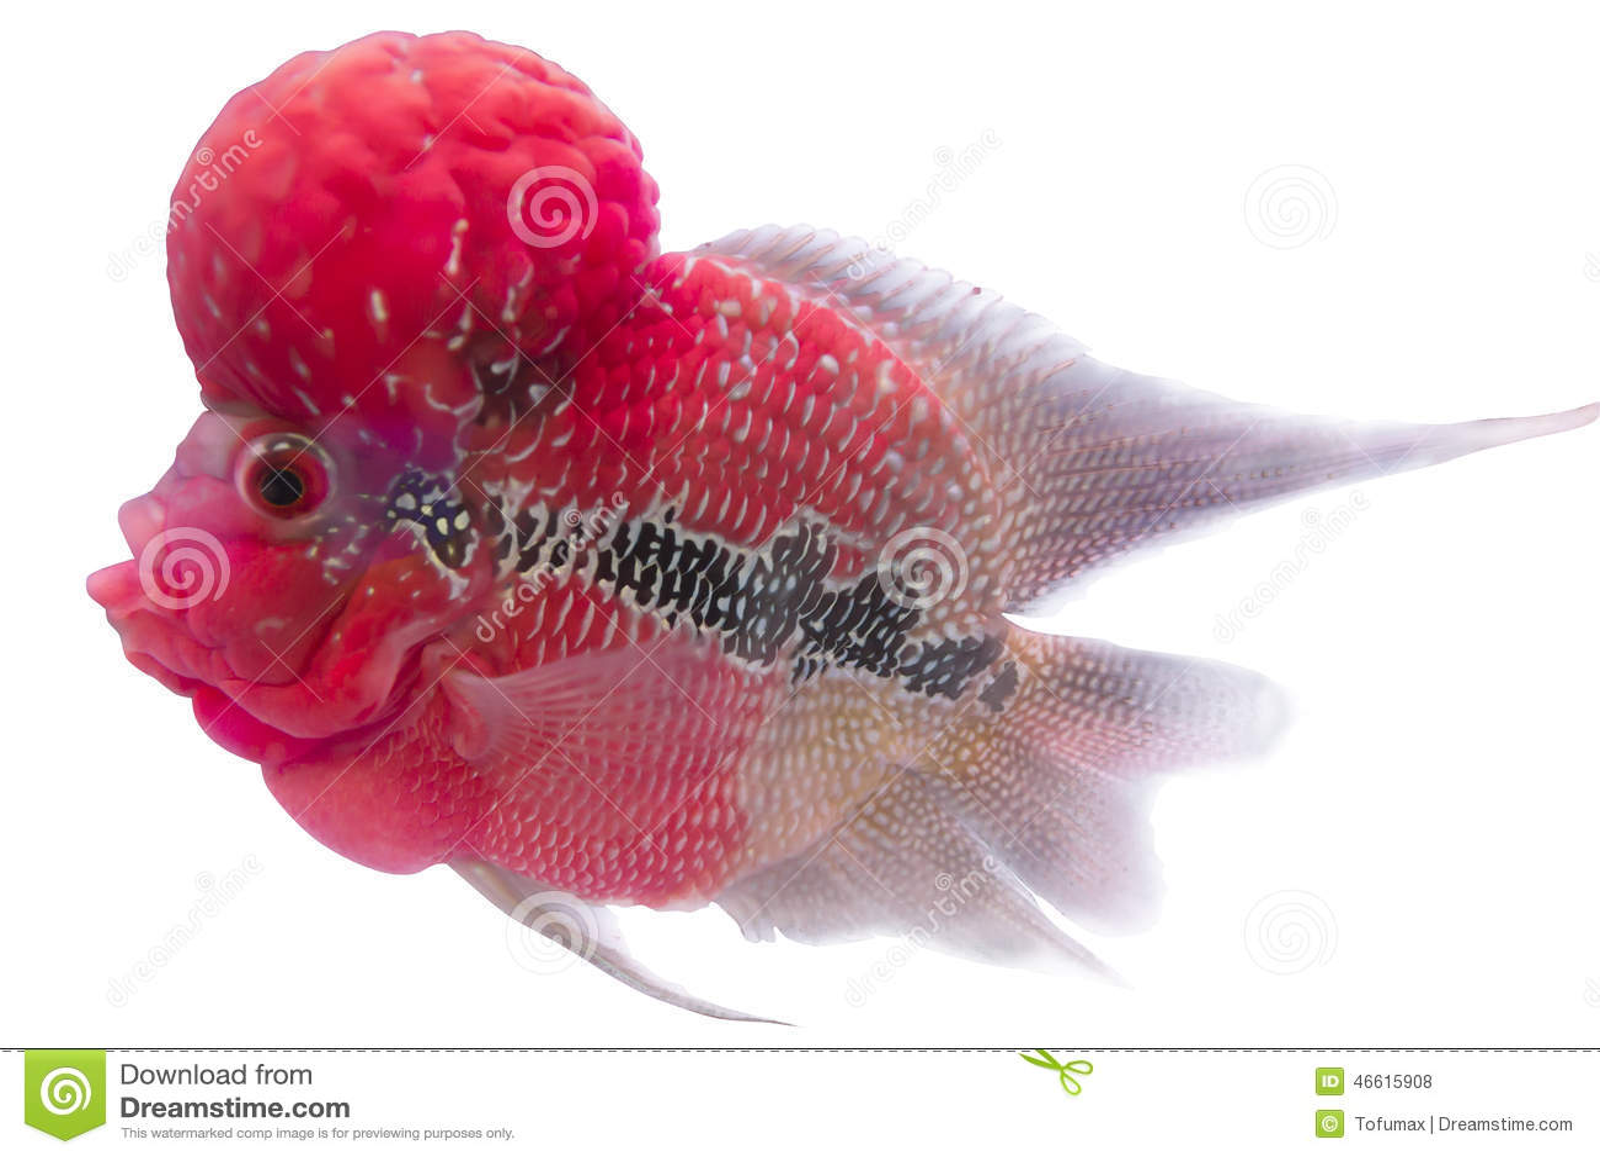 flower horn fish stock photo image of head pattern 46615908 rh dreamstime com Baby Flowerhorn Fish Discus Fish